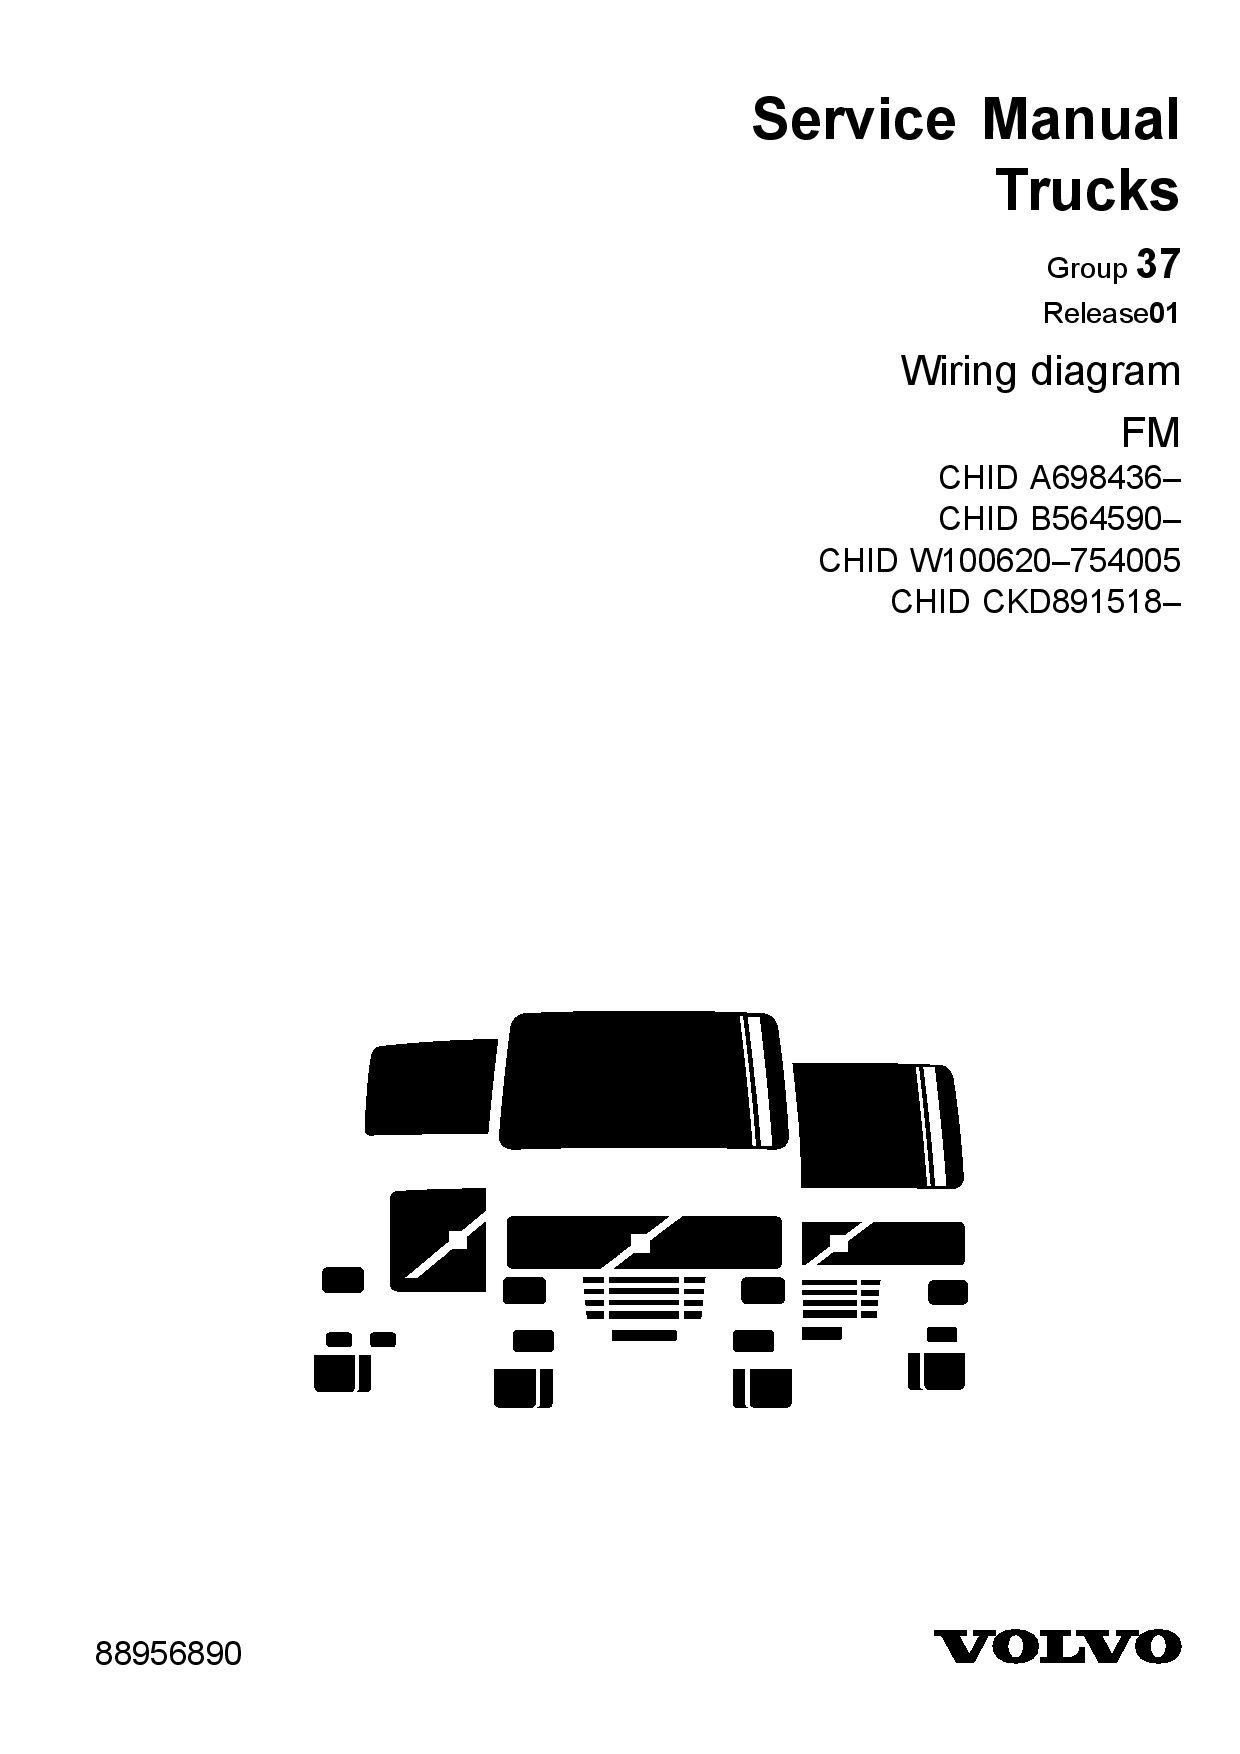 [DIAGRAM] 2007 Mazda B Series Truck Service Wiring Diagram